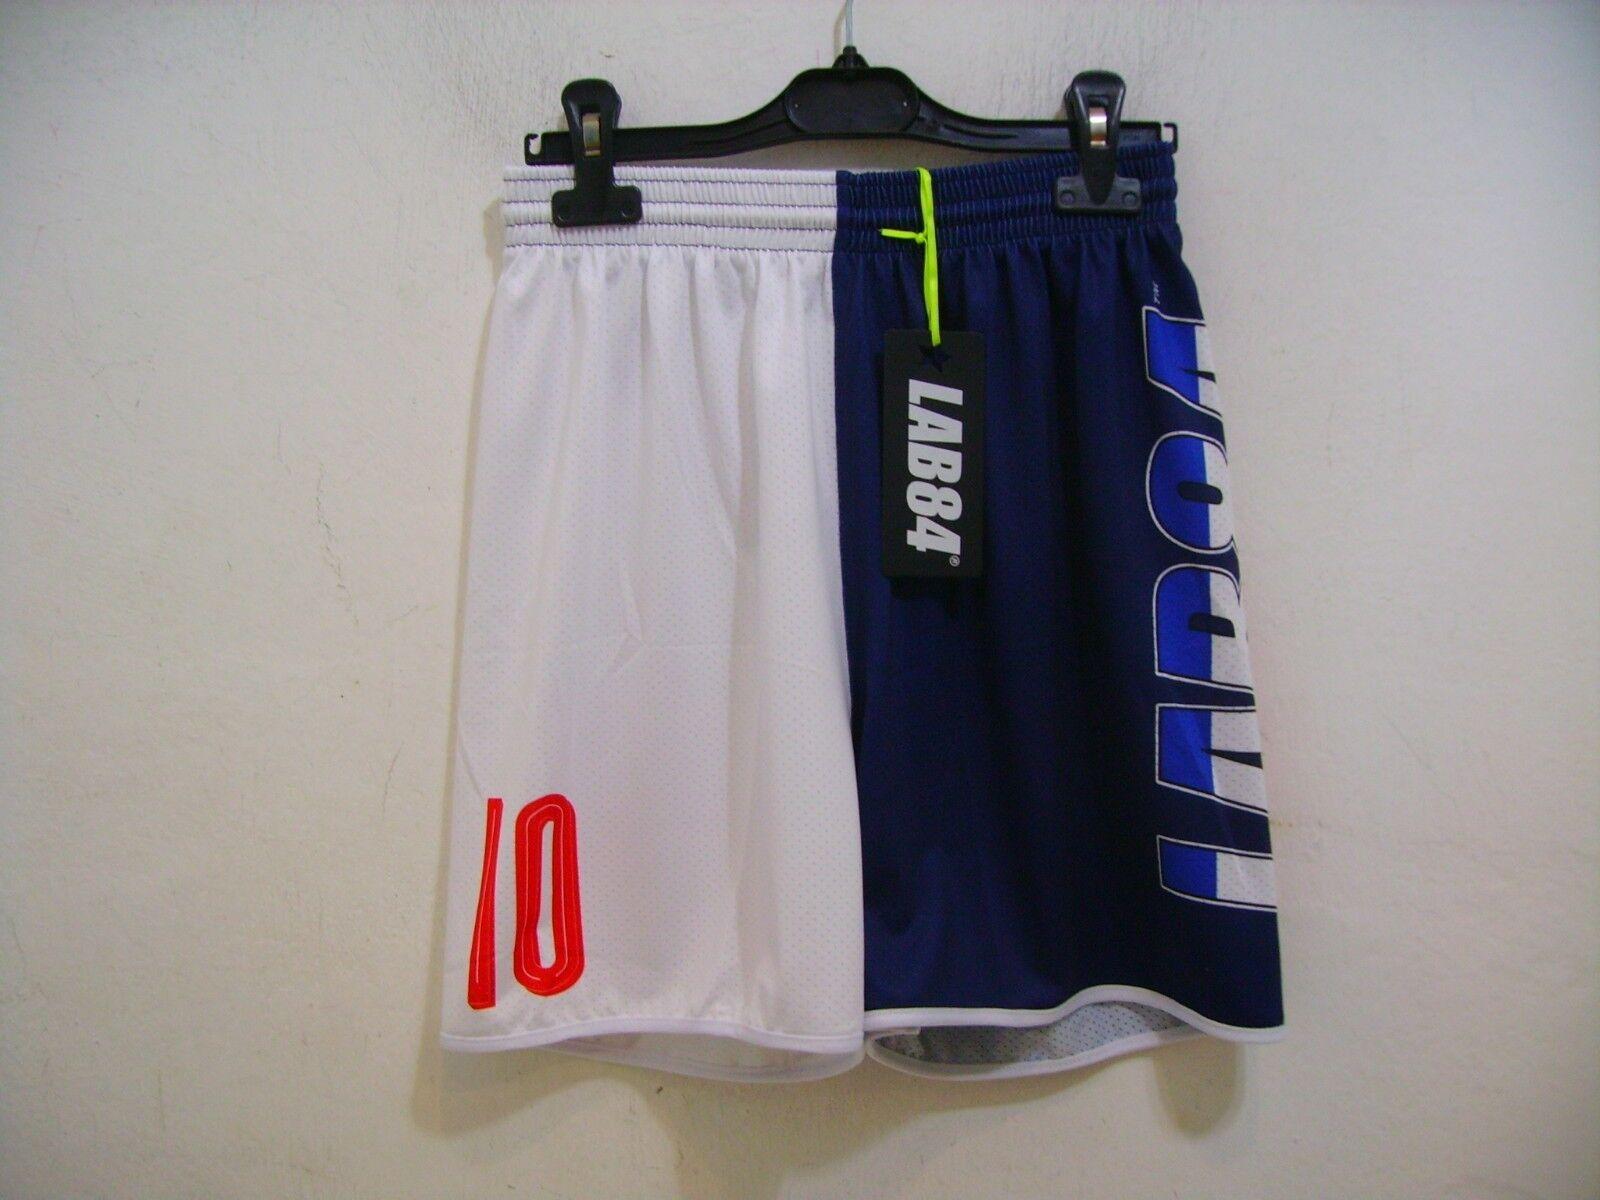 Lab84 Costume Shorts Dryfit Shtu1008flag France bluee White